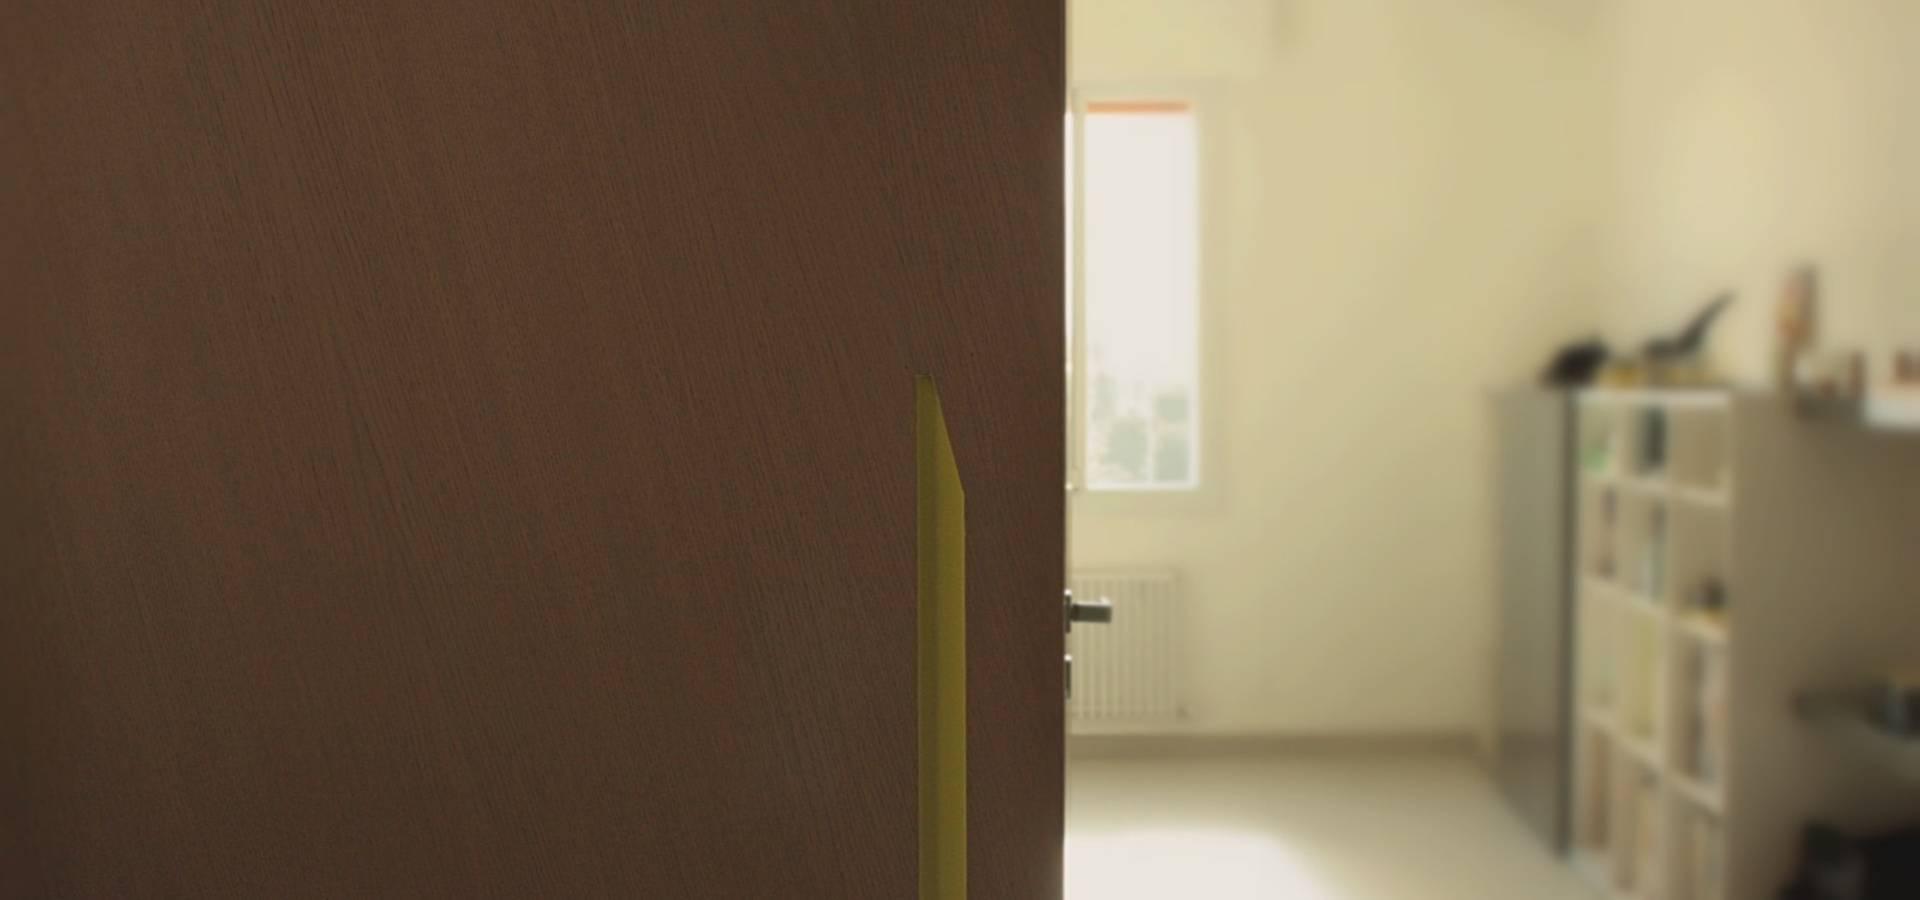 Uaig ufficio architettura interni grammauta architetti for Idee architettura interni